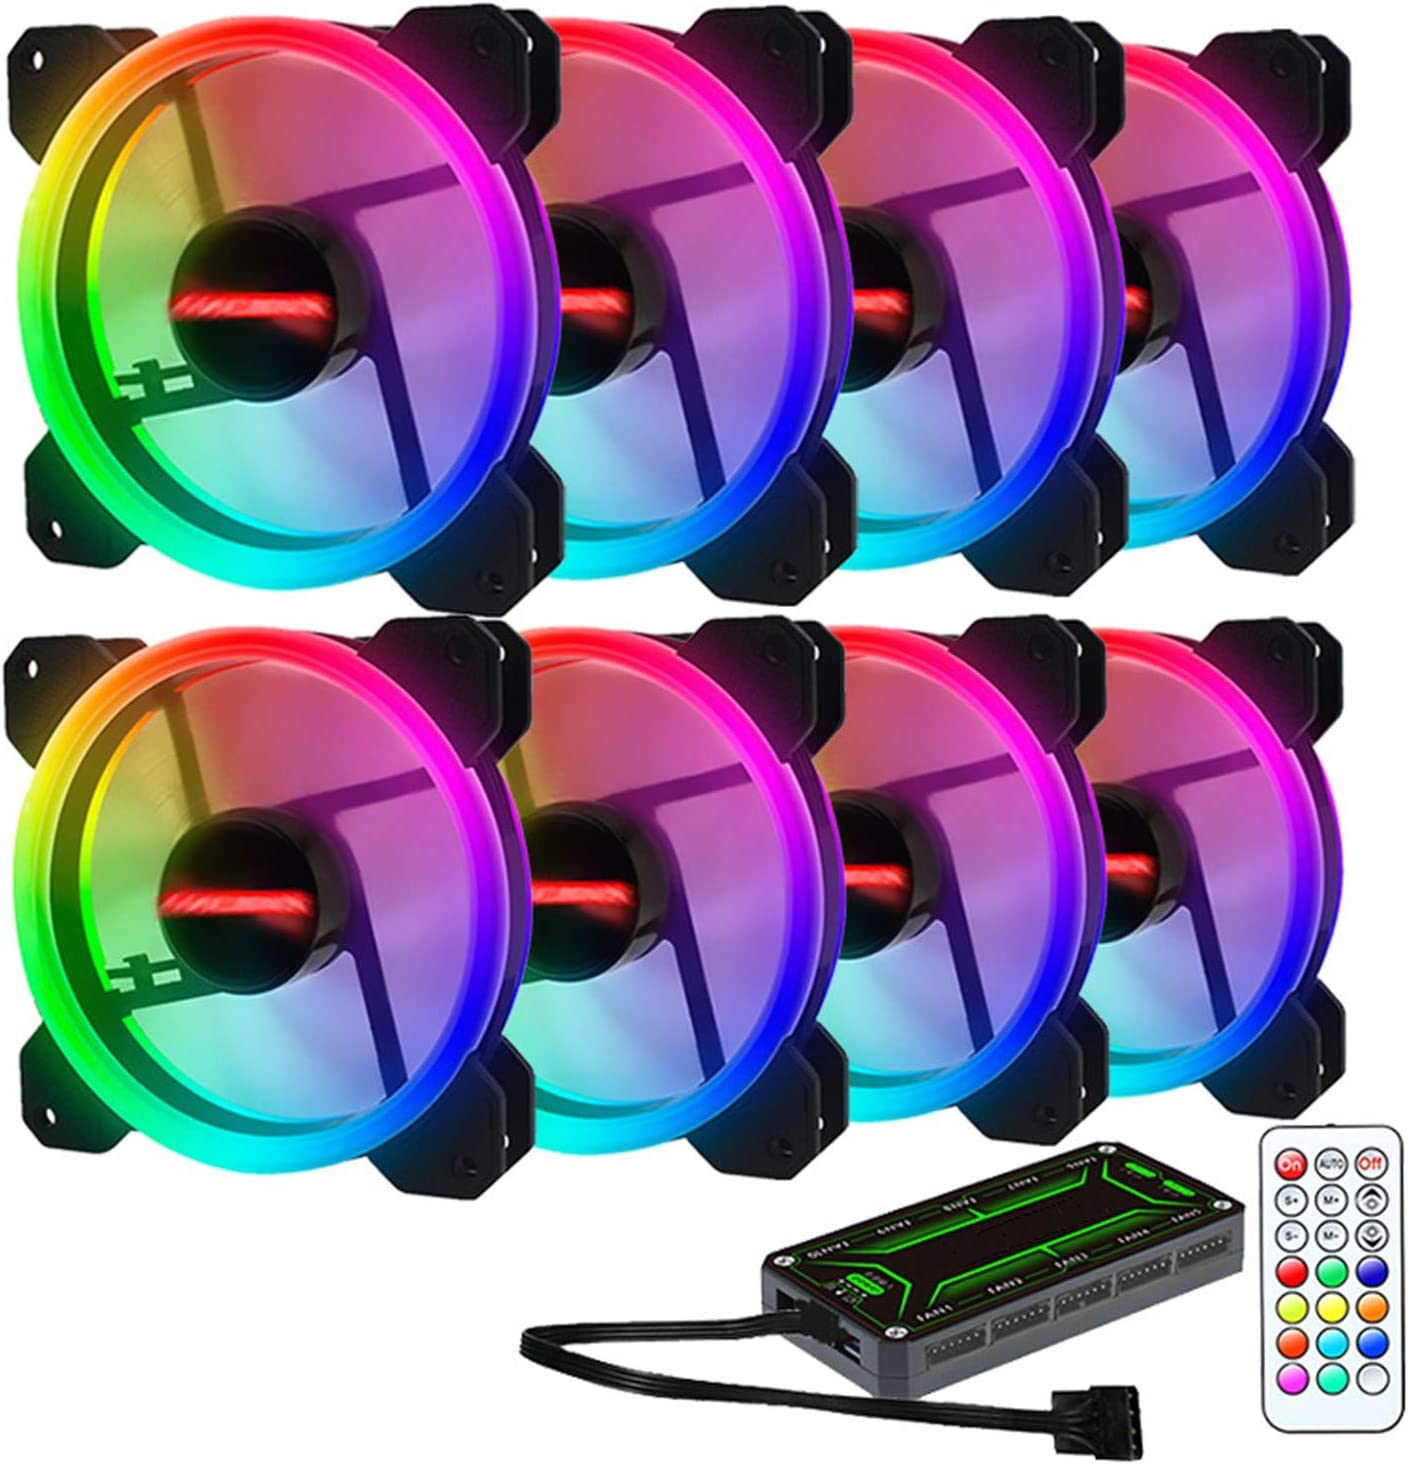 1 Controller. 8 Fans ZXLLAFT RGB 120Mm Dual Halo PC Cooling Fan